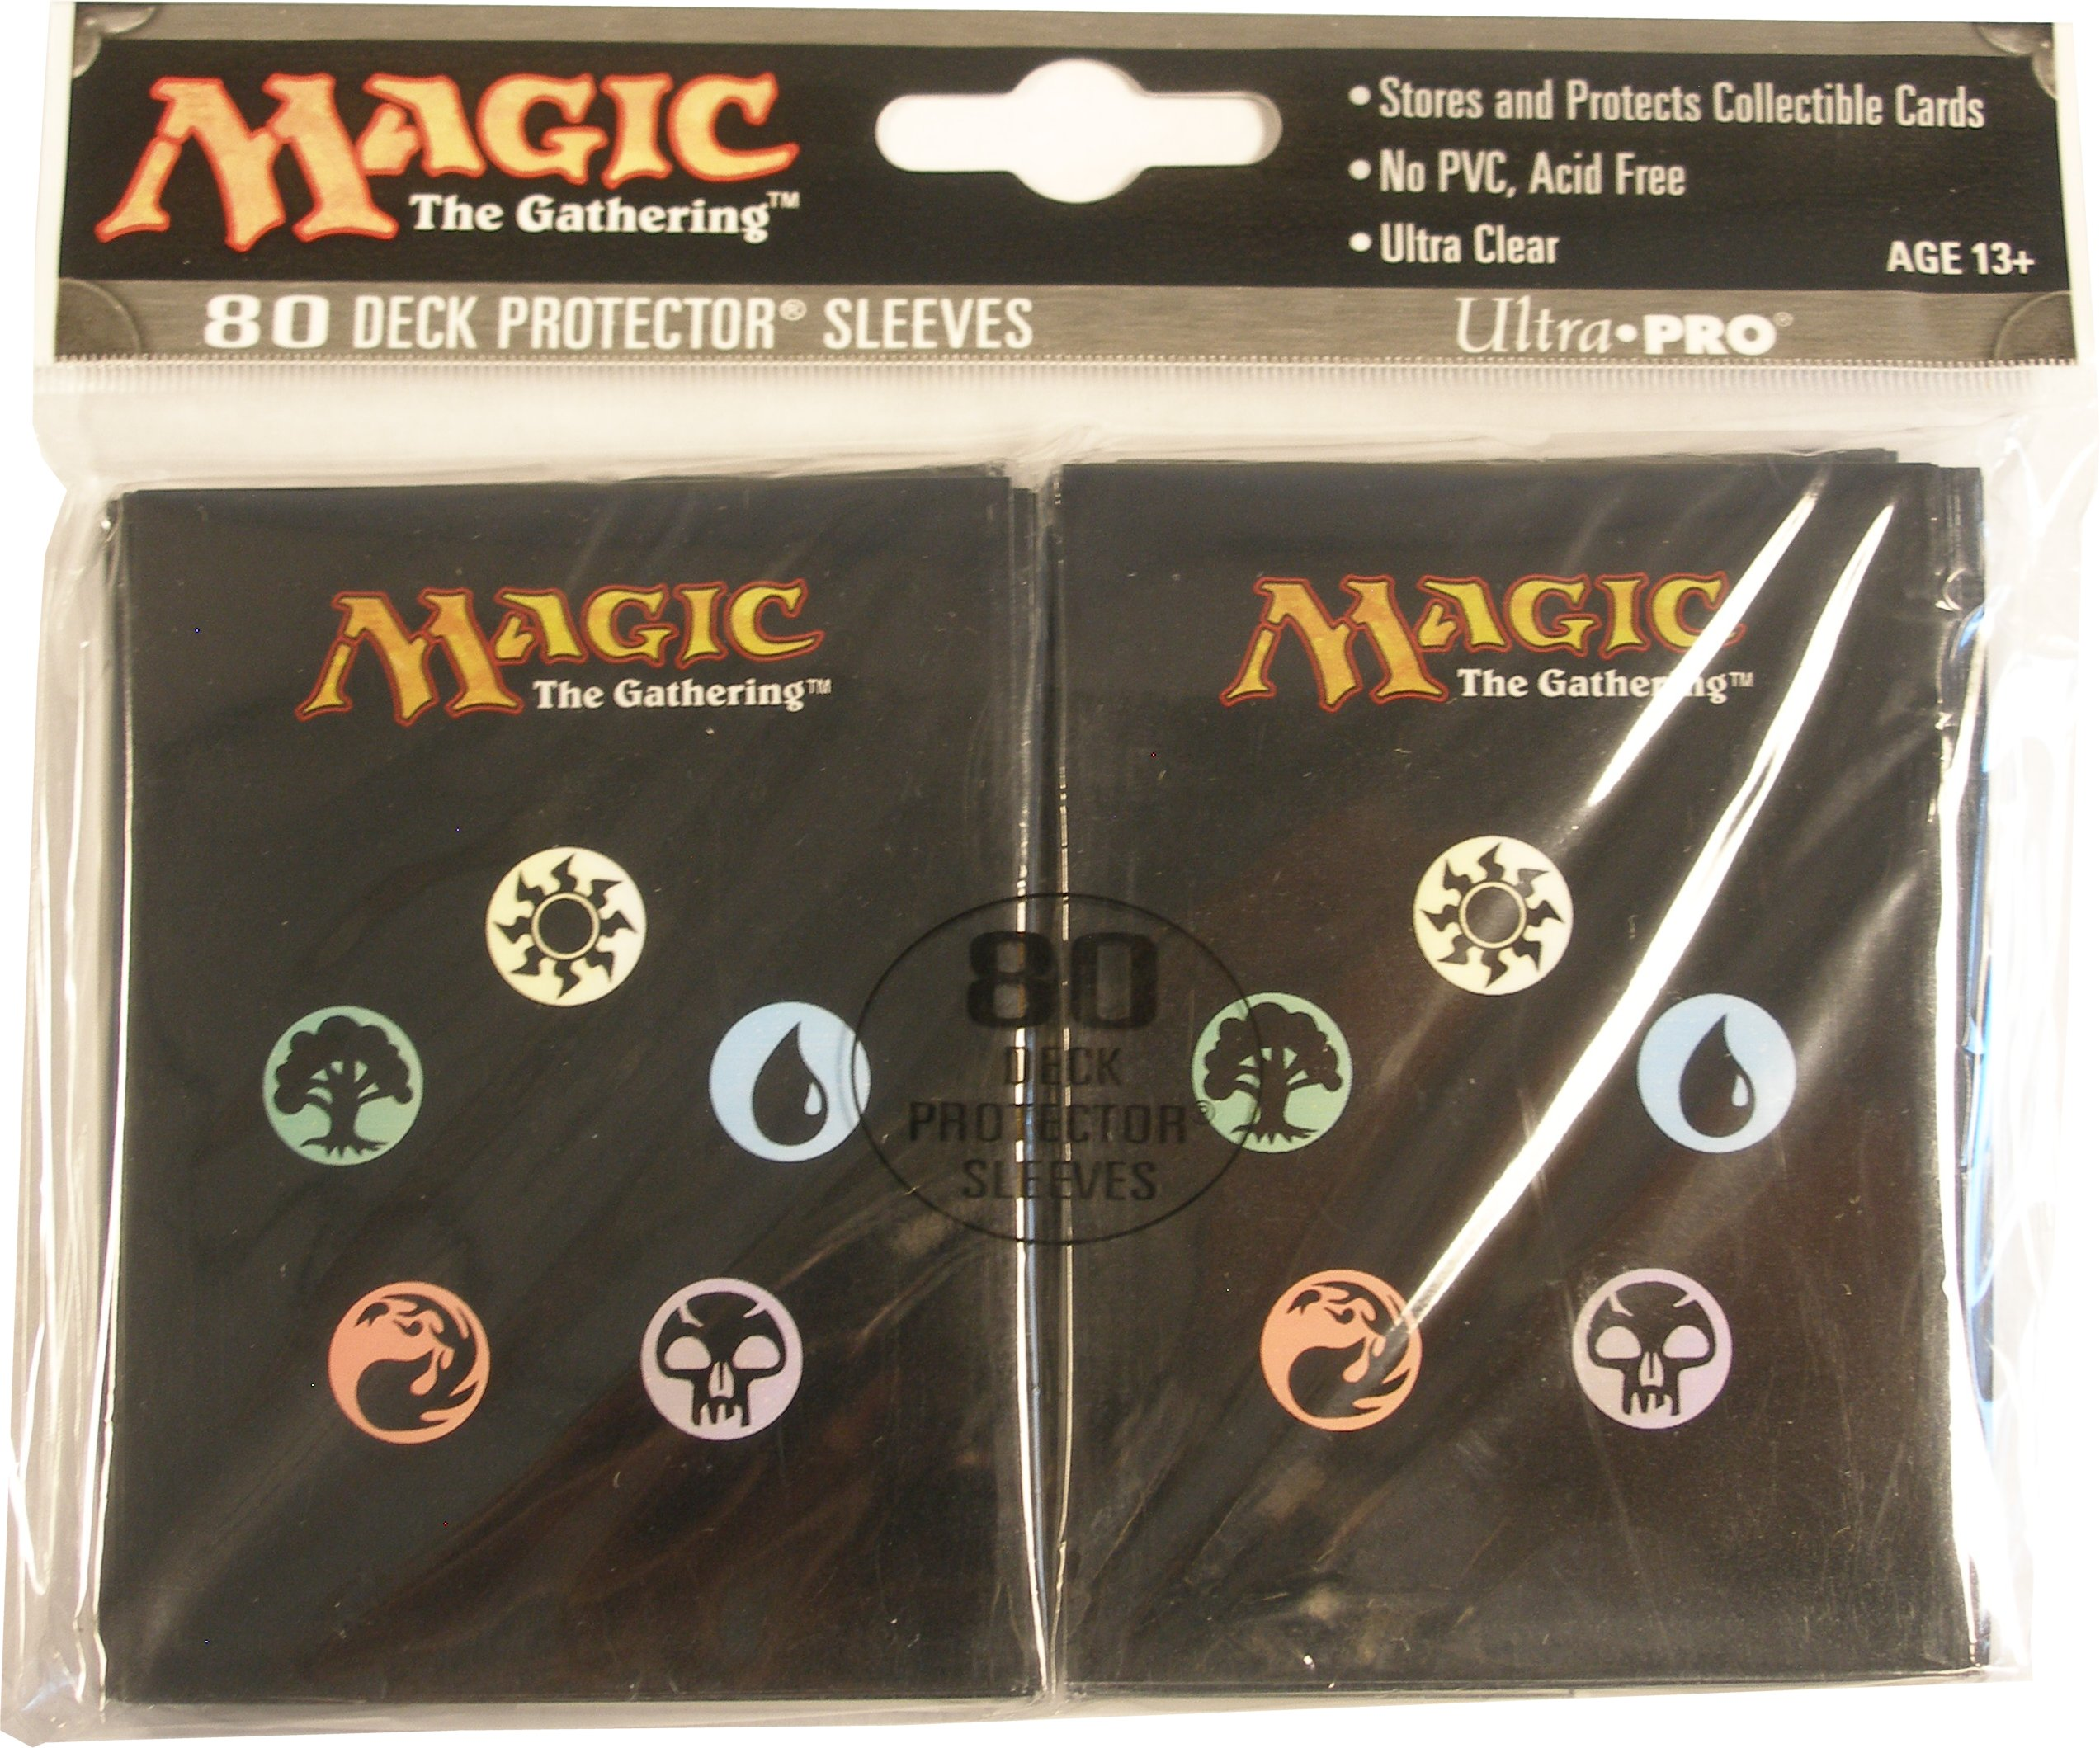 Ultra pro std deck prot magic mana 10 packs potomac ultra pro standard size deck protectors magic mana symbol 10 packs biocorpaavc